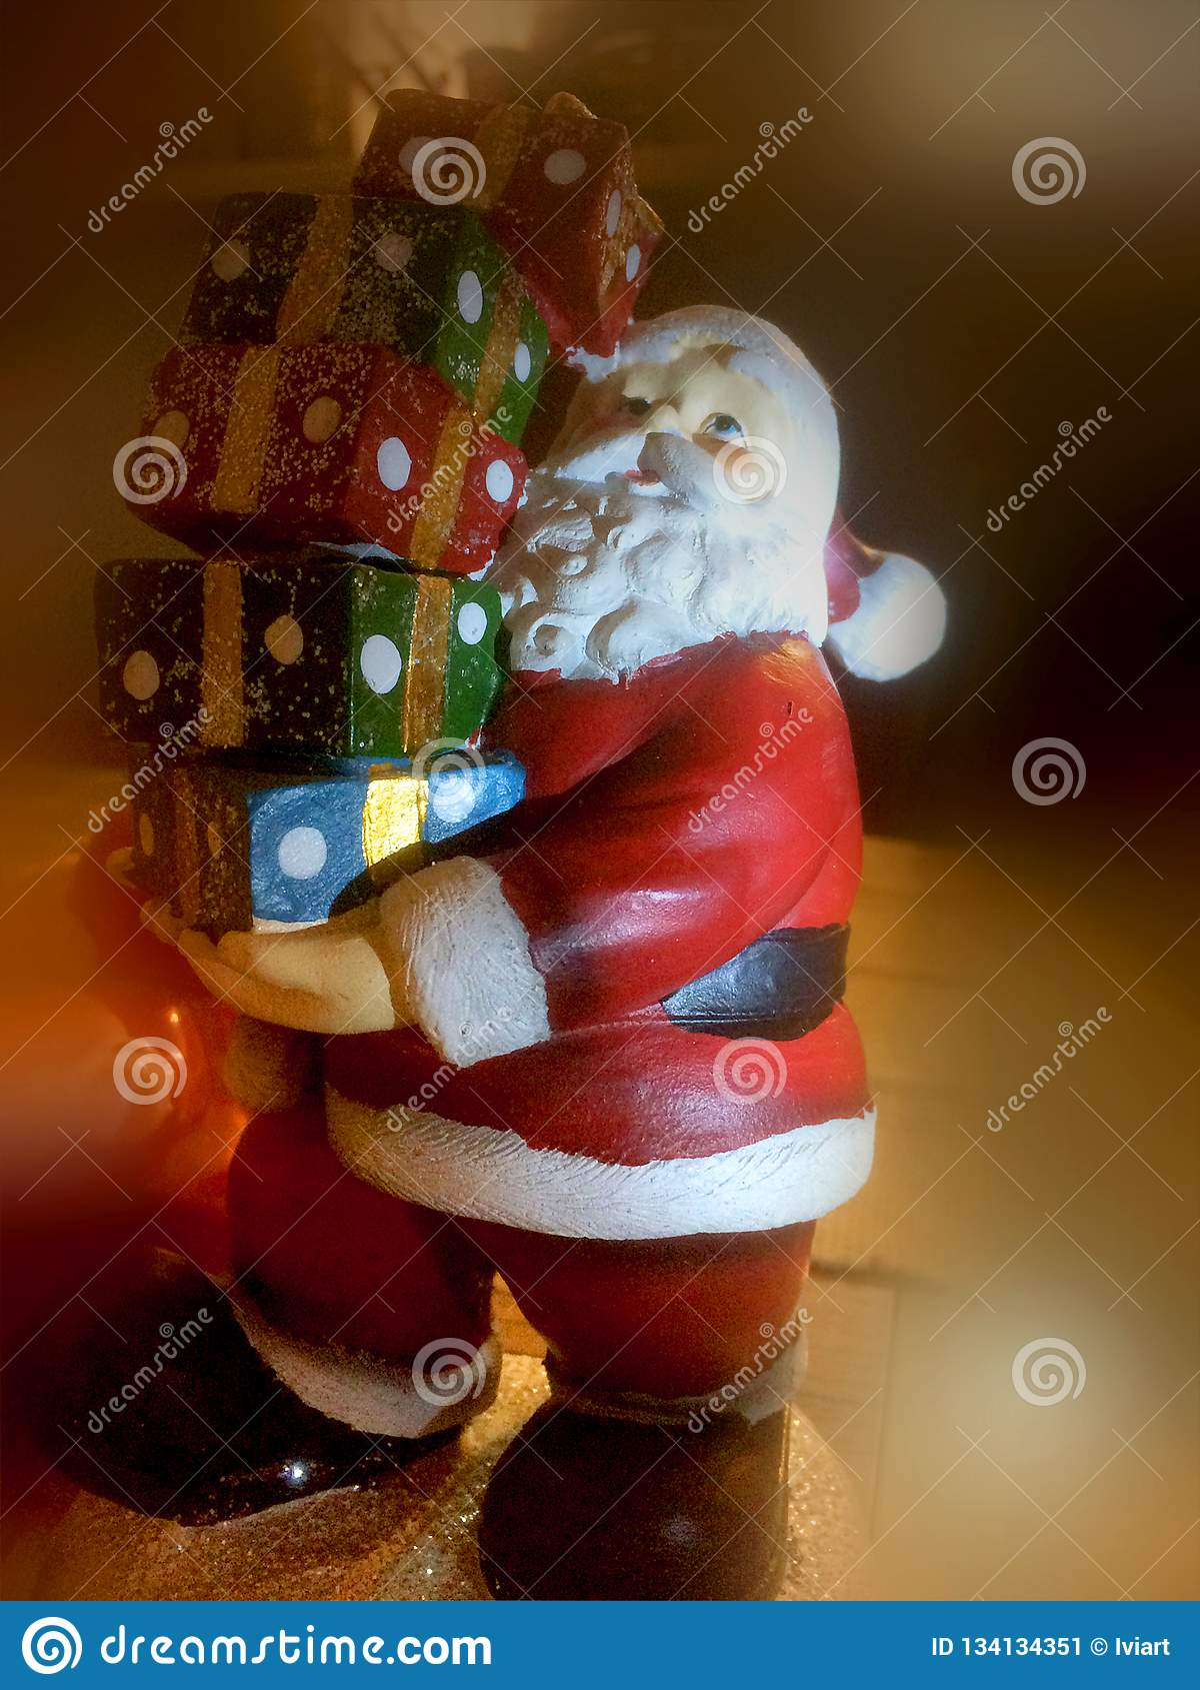 Figurilla de Papá Noel